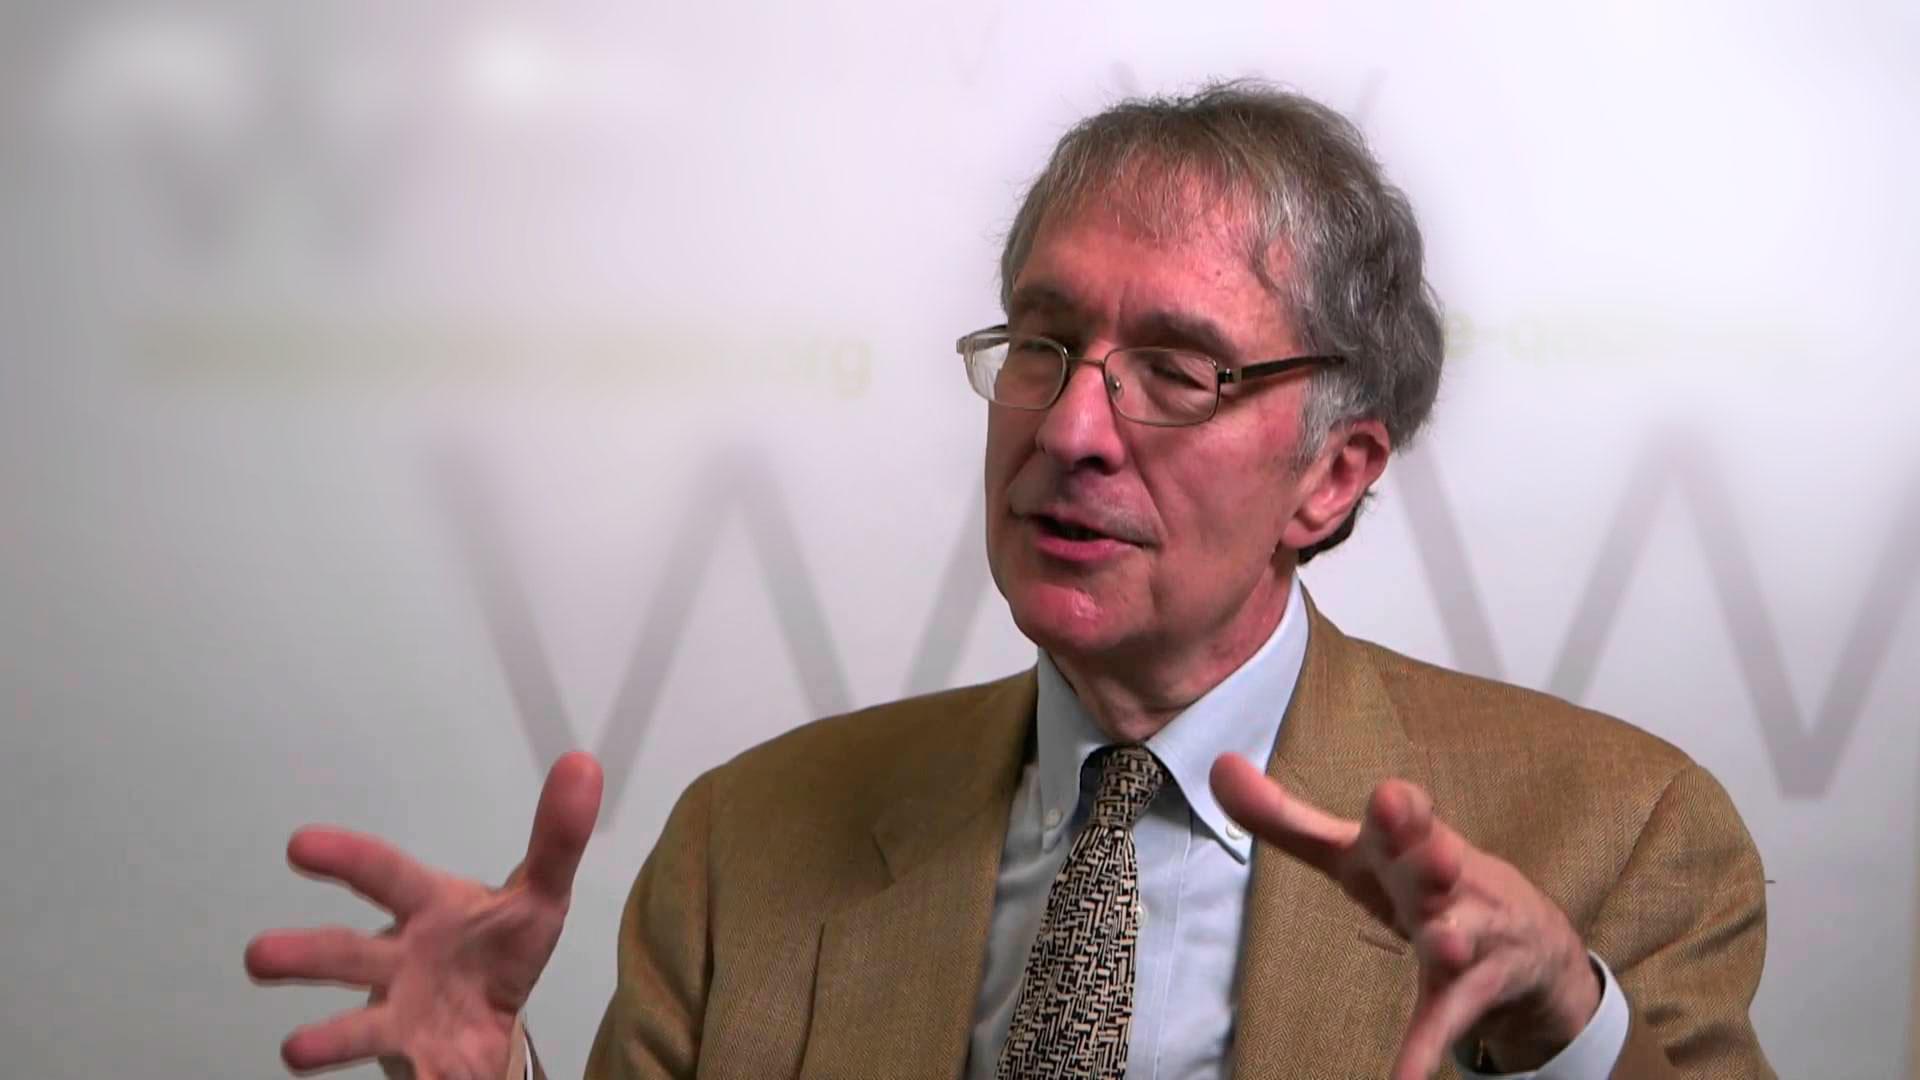 inteligencias múltiples teoría de Howard gardner